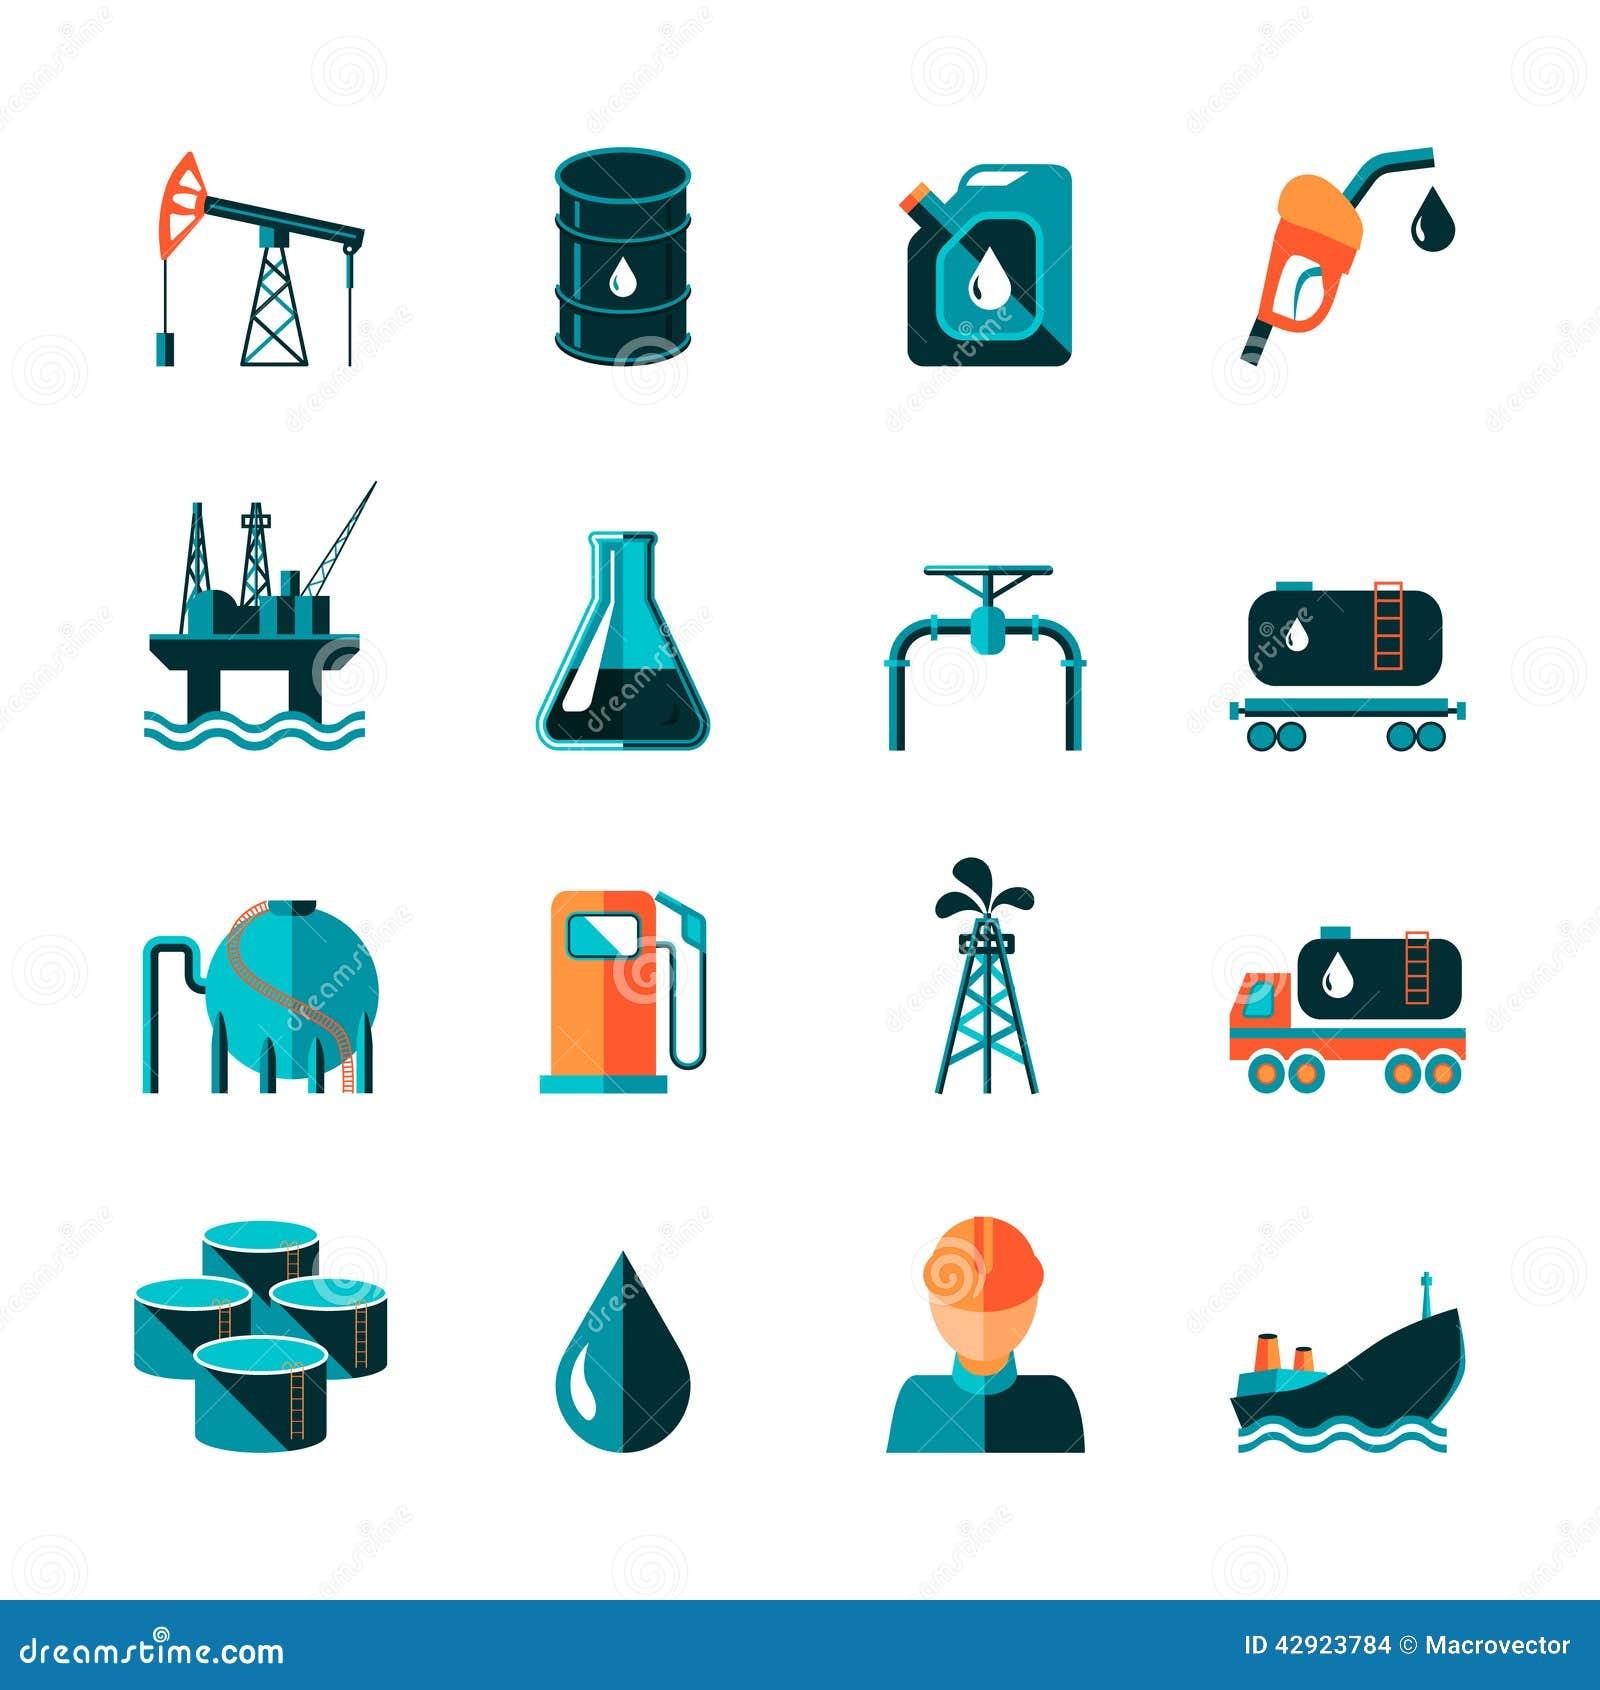 Crude Oil Assay